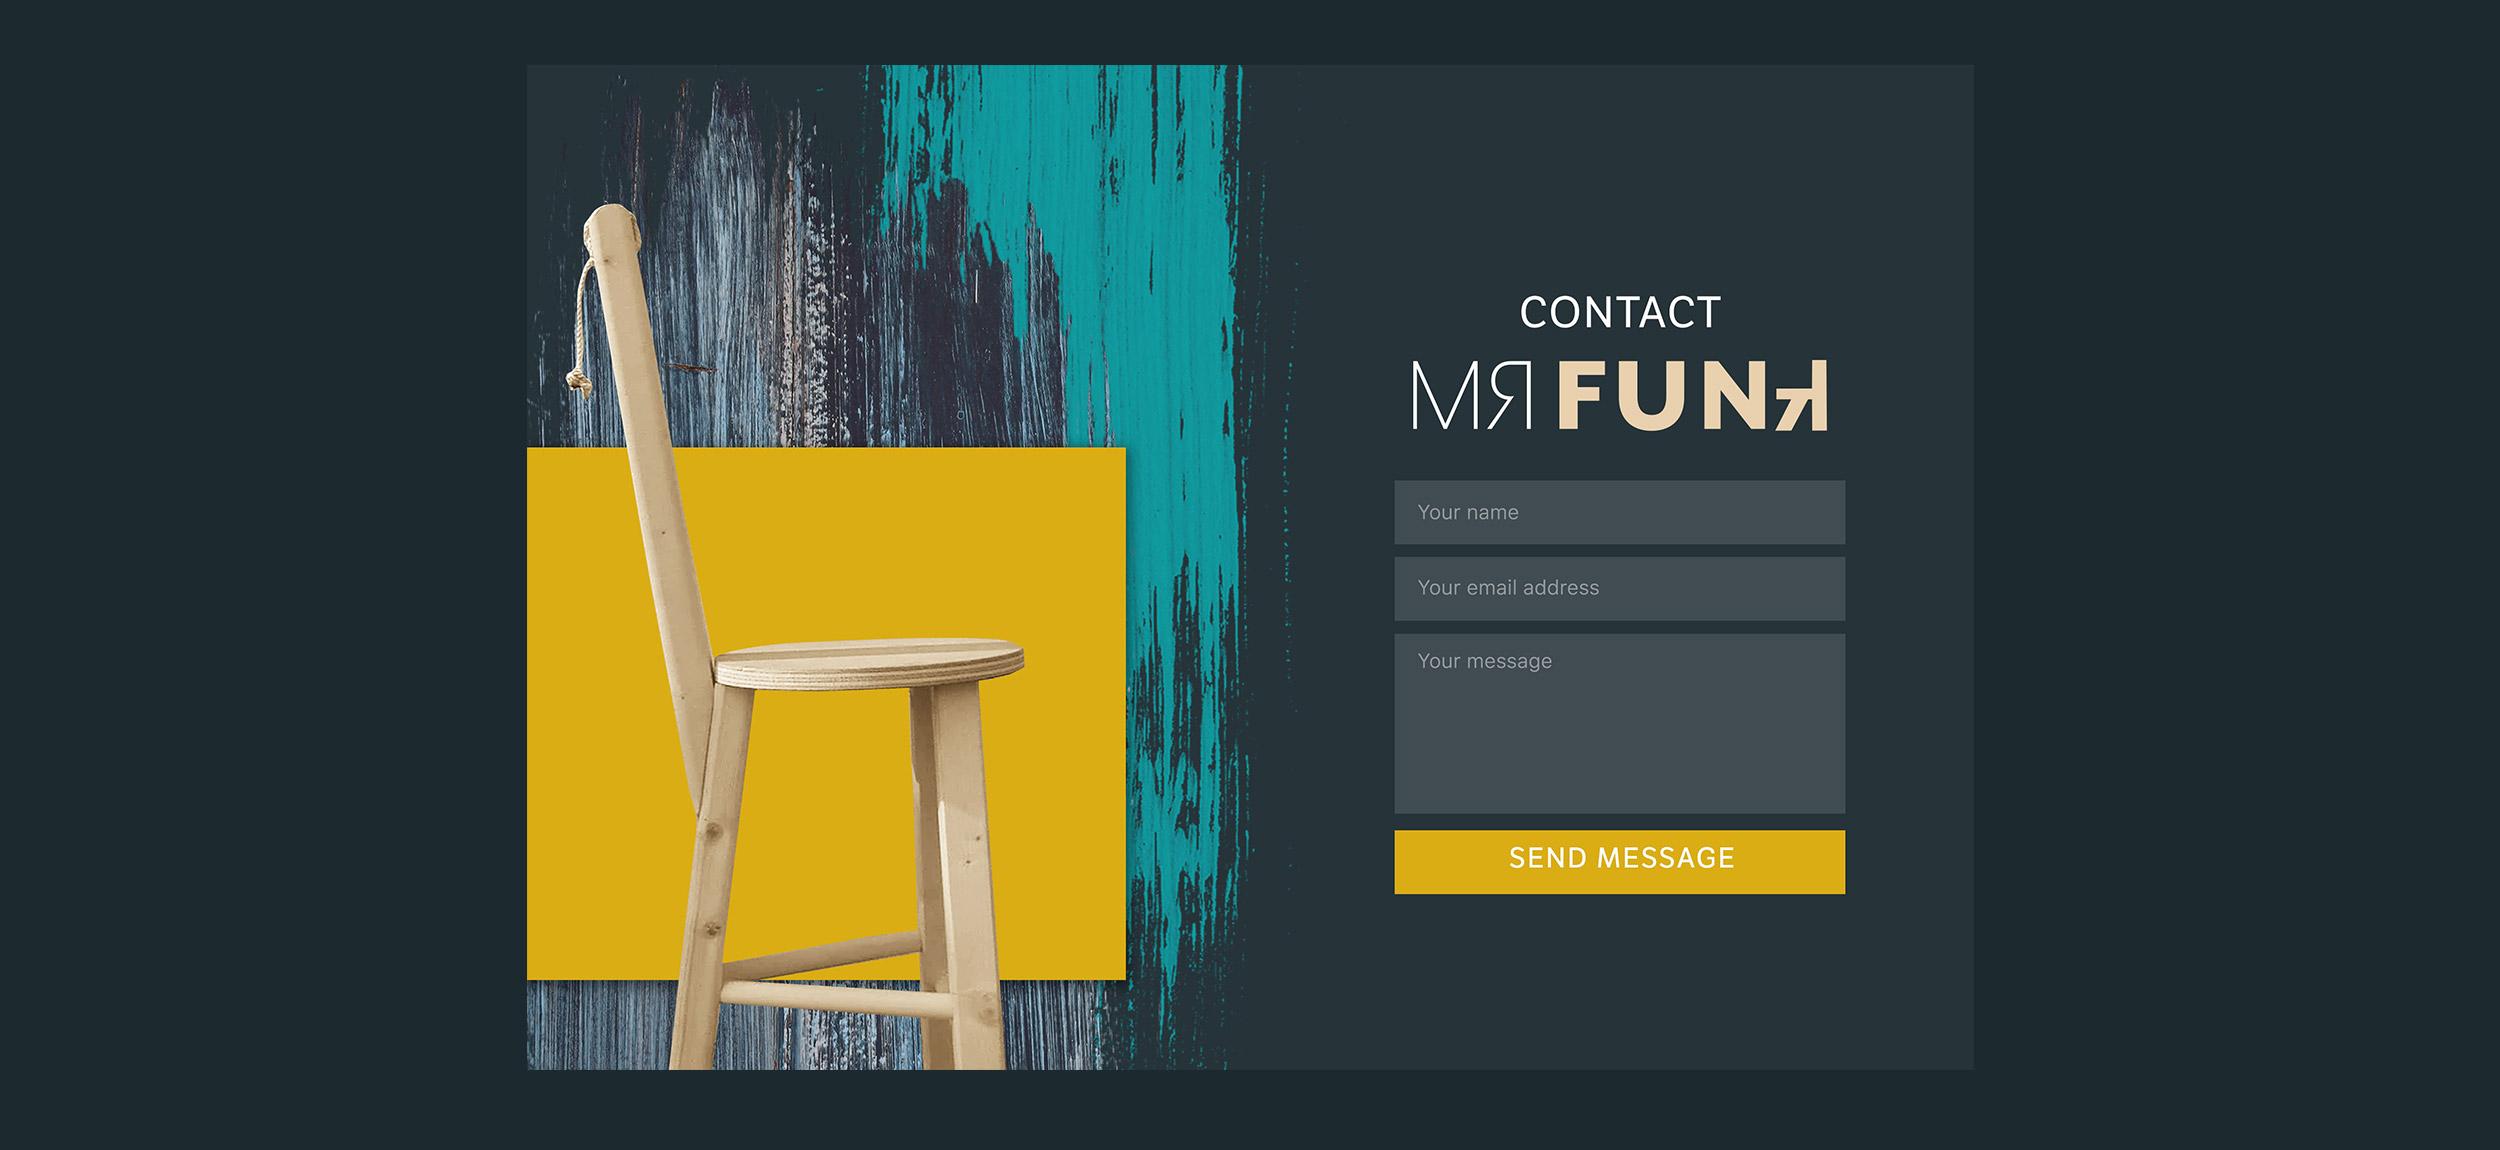 funk-contact.jpg